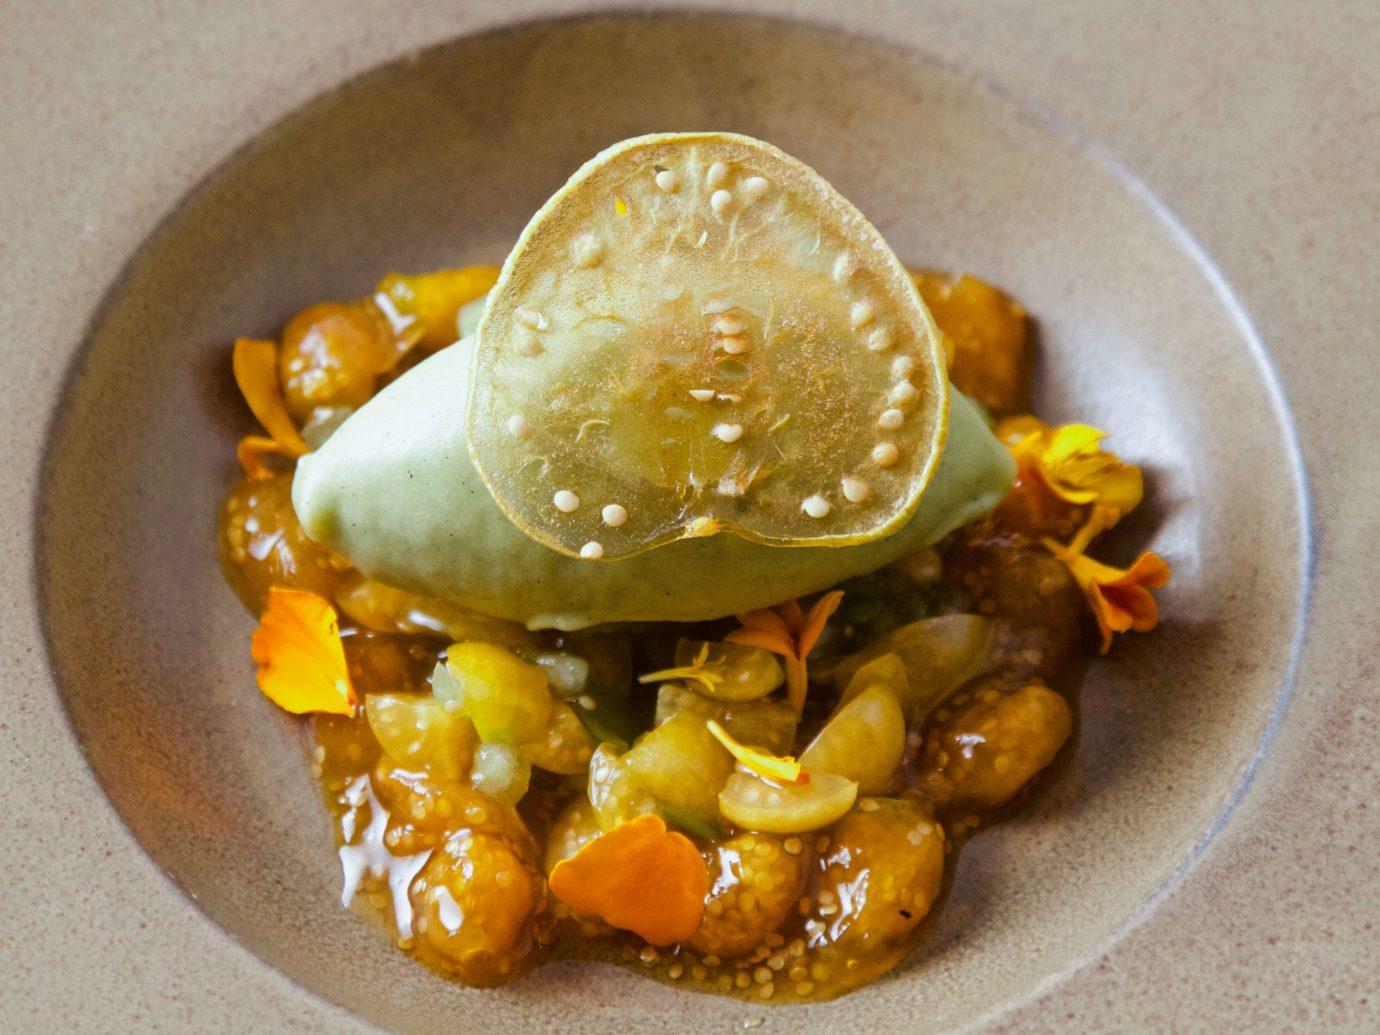 Food + Drink food plate dish cuisine recipe vegetarian food curry indian cuisine meal breakfast